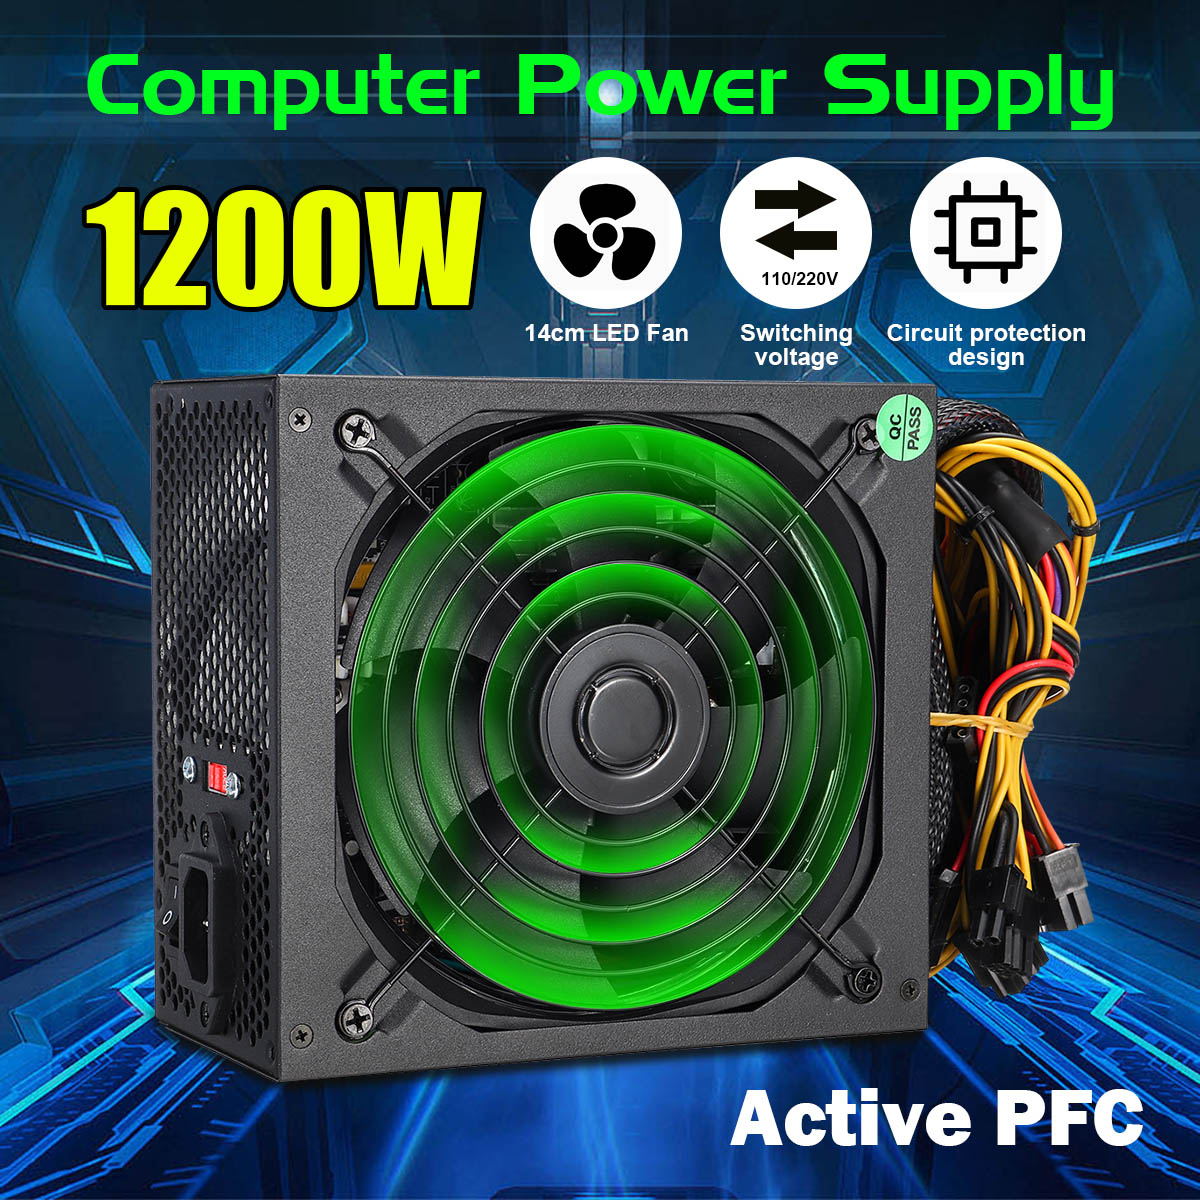 1200W PC Power Supply For Computer Module PC PSU PFC 24Pin SATA 6Pin 4Pin 14cm Quiet LED Fan 110~220V